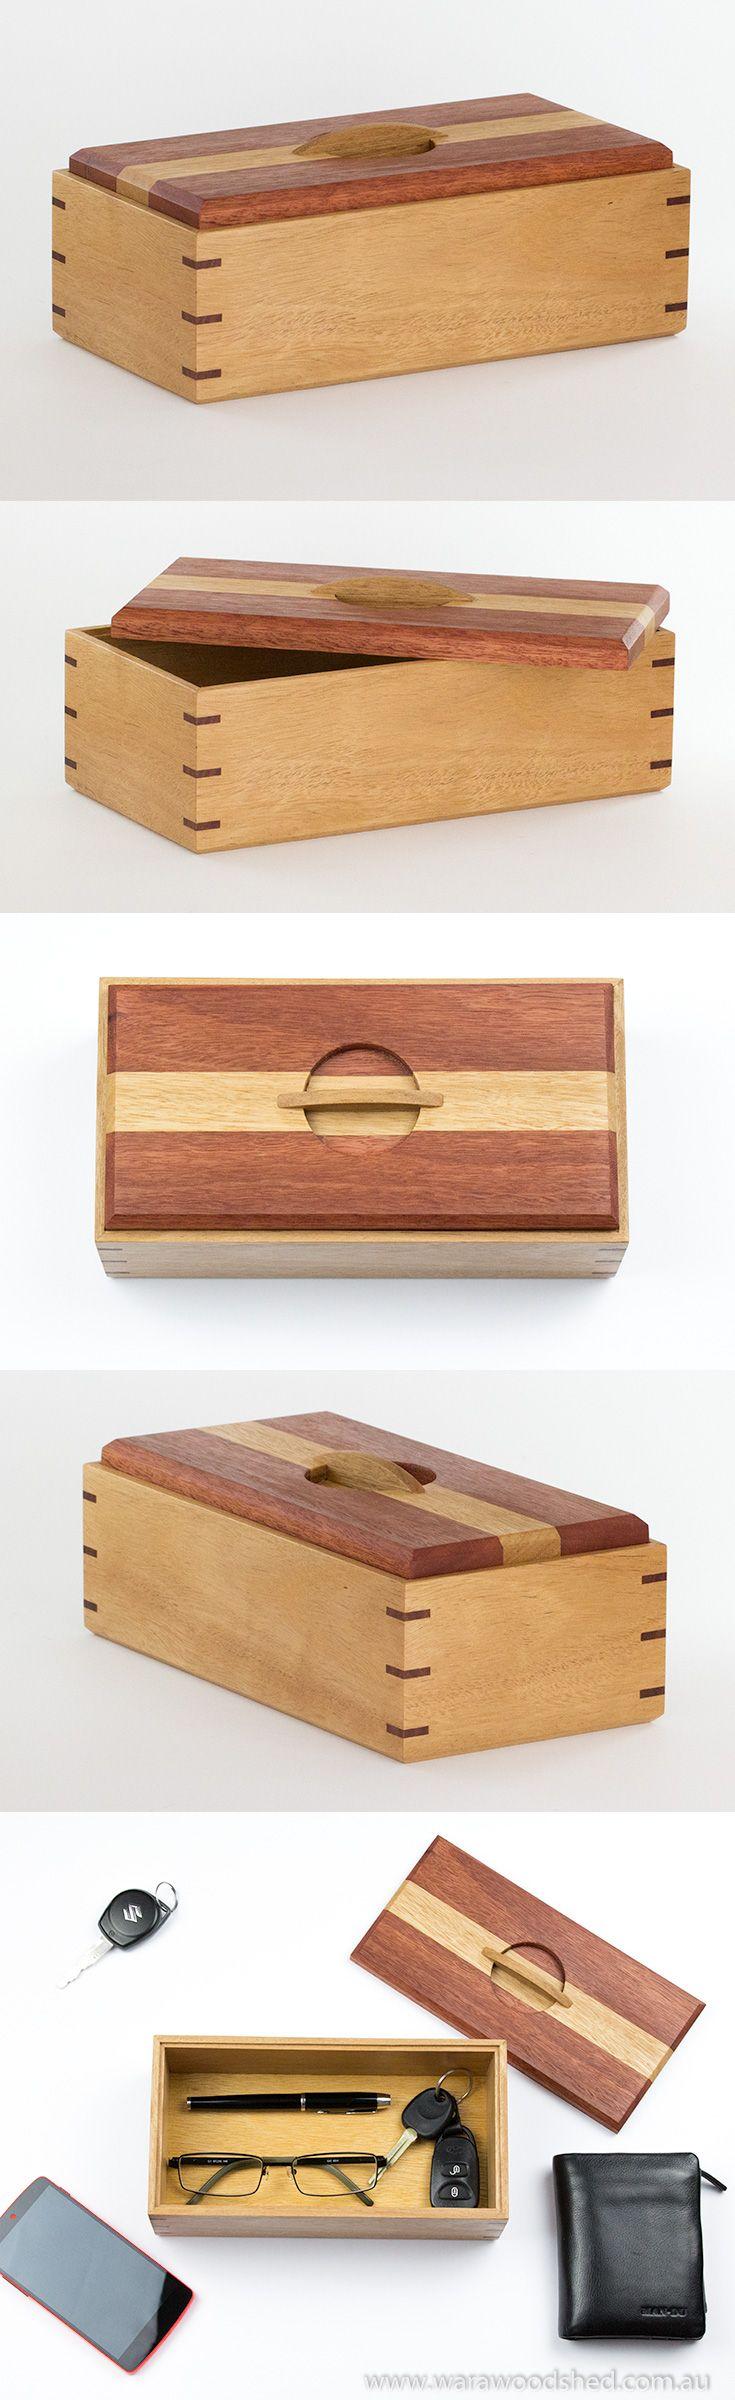 A Wooden Keepsake Box Made From Australian Timbers